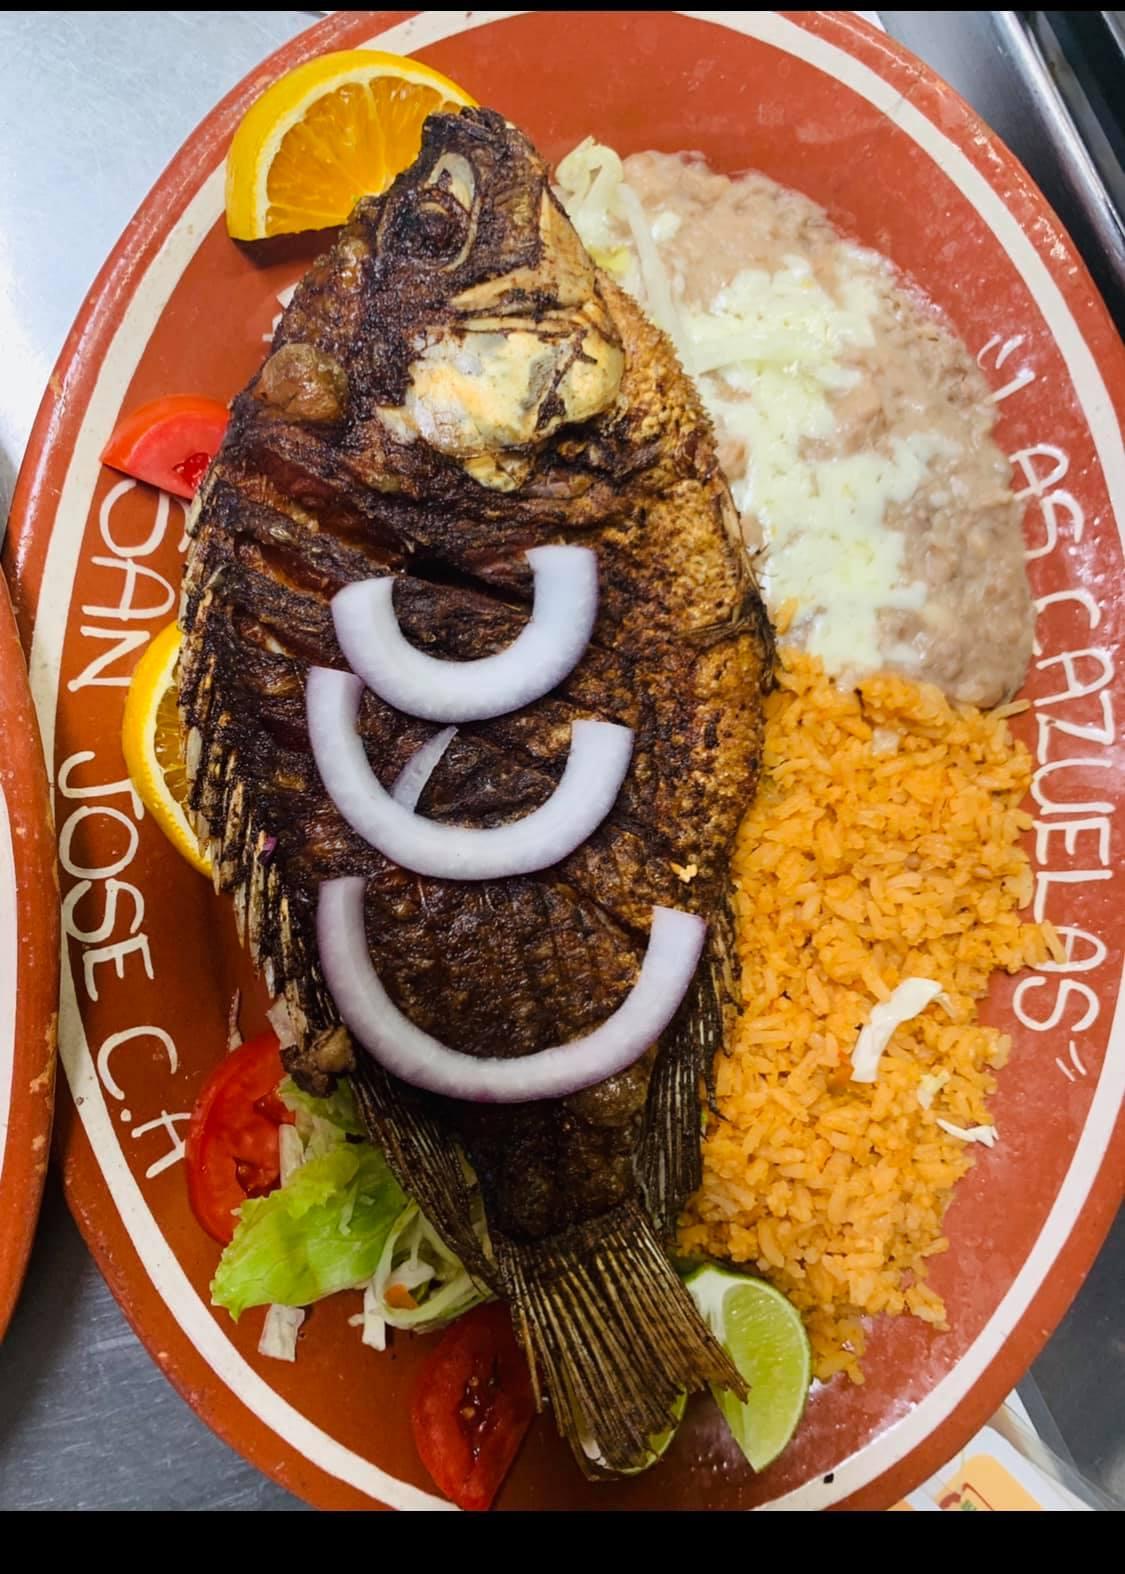 https://0201.nccdn.net/1_2/000/000/0b8/817/cazuelas-food-on-plate-3.jpg